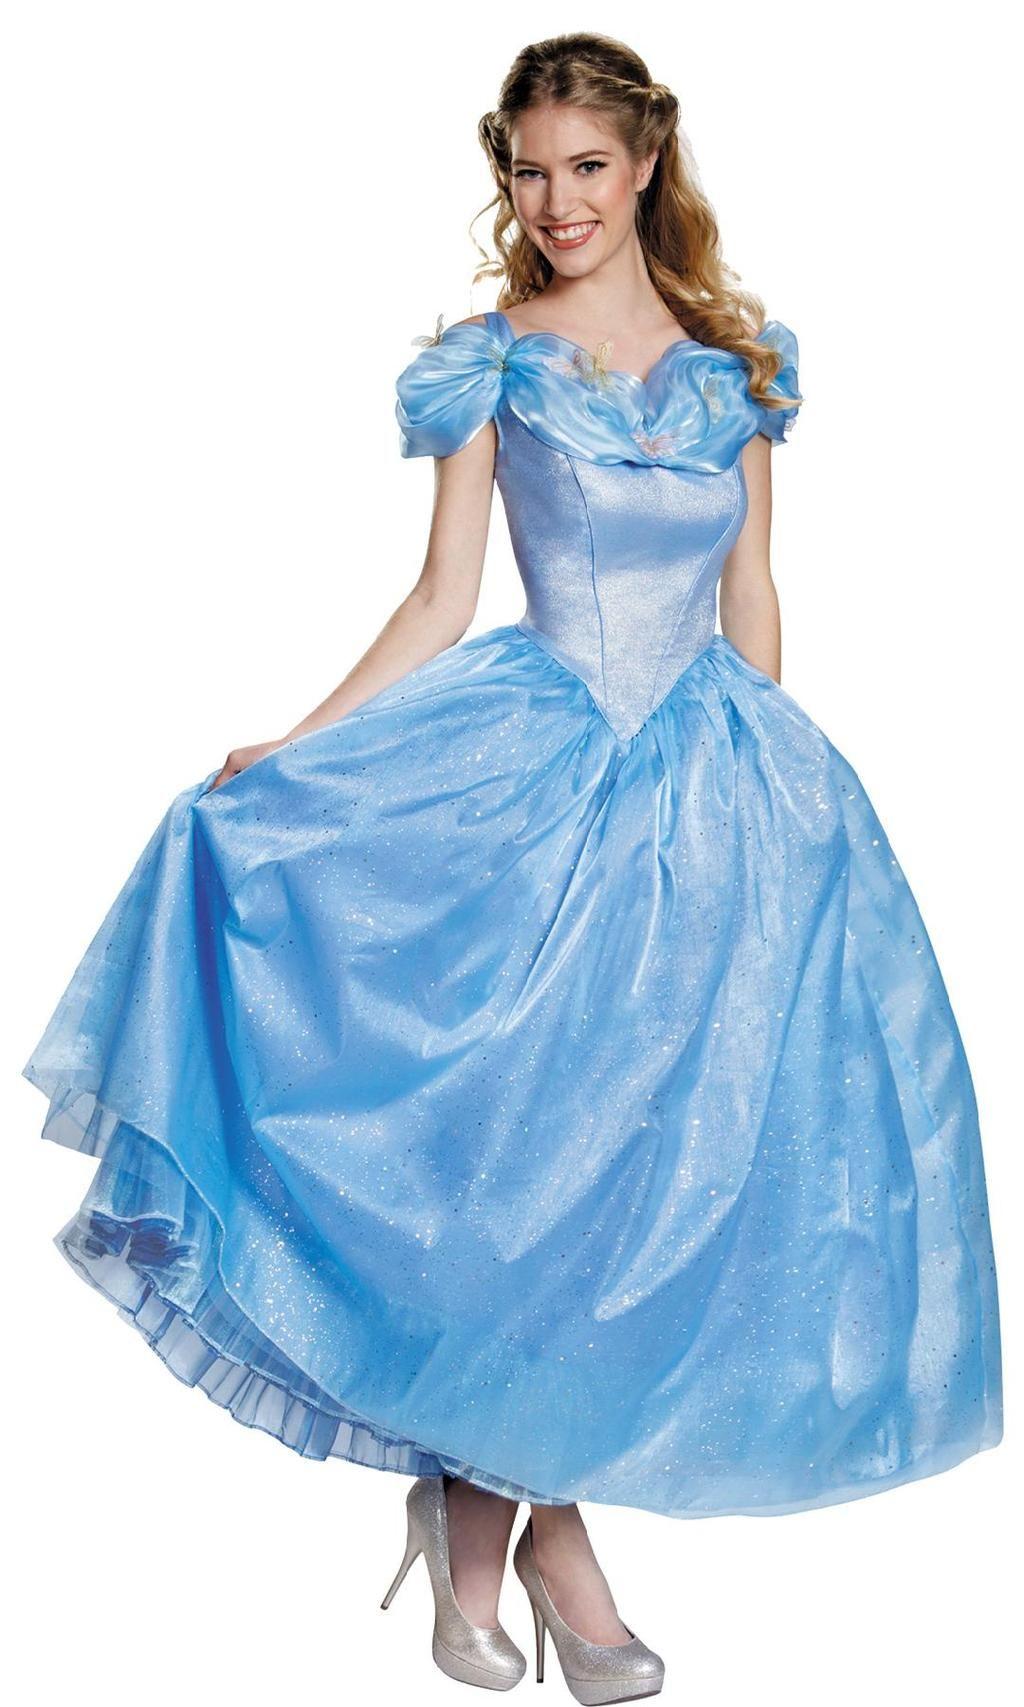 Cinderella Movie Deluxe Costume Costumes for women